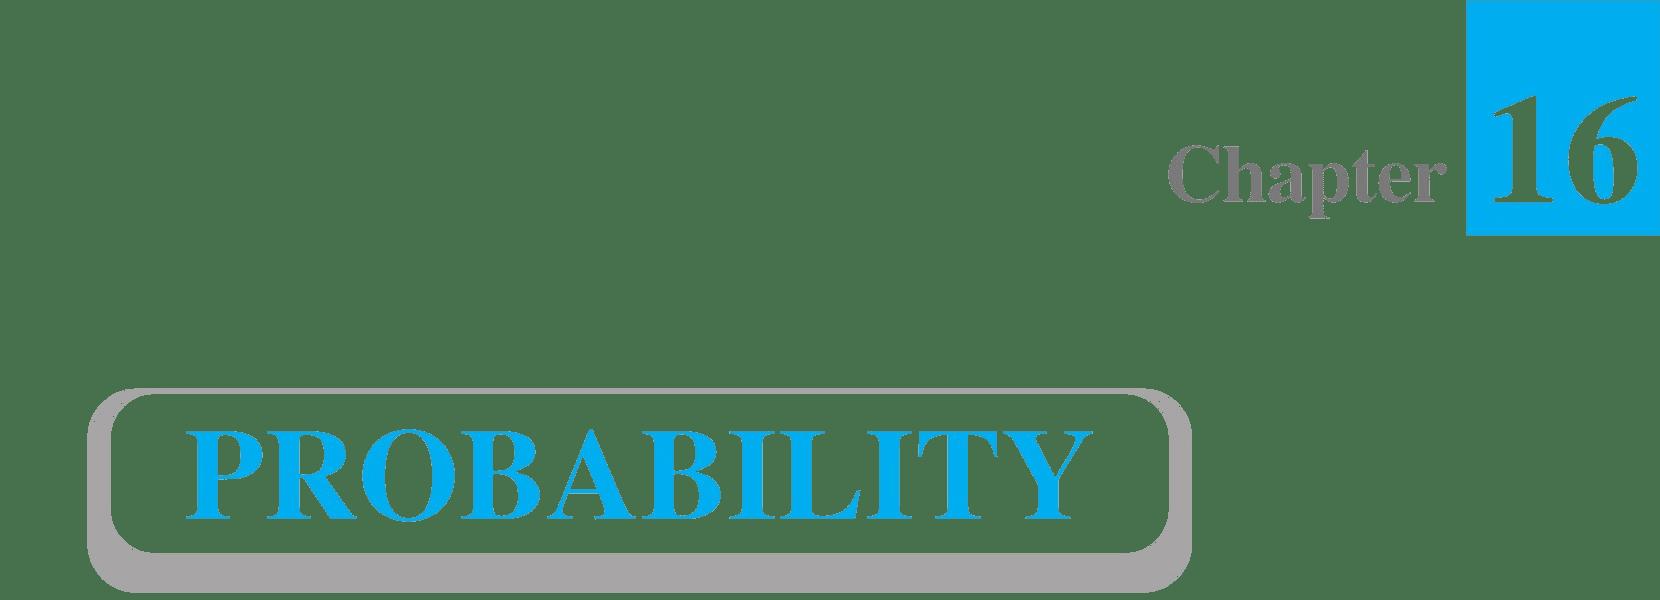 16 Probability Class 11 Maths